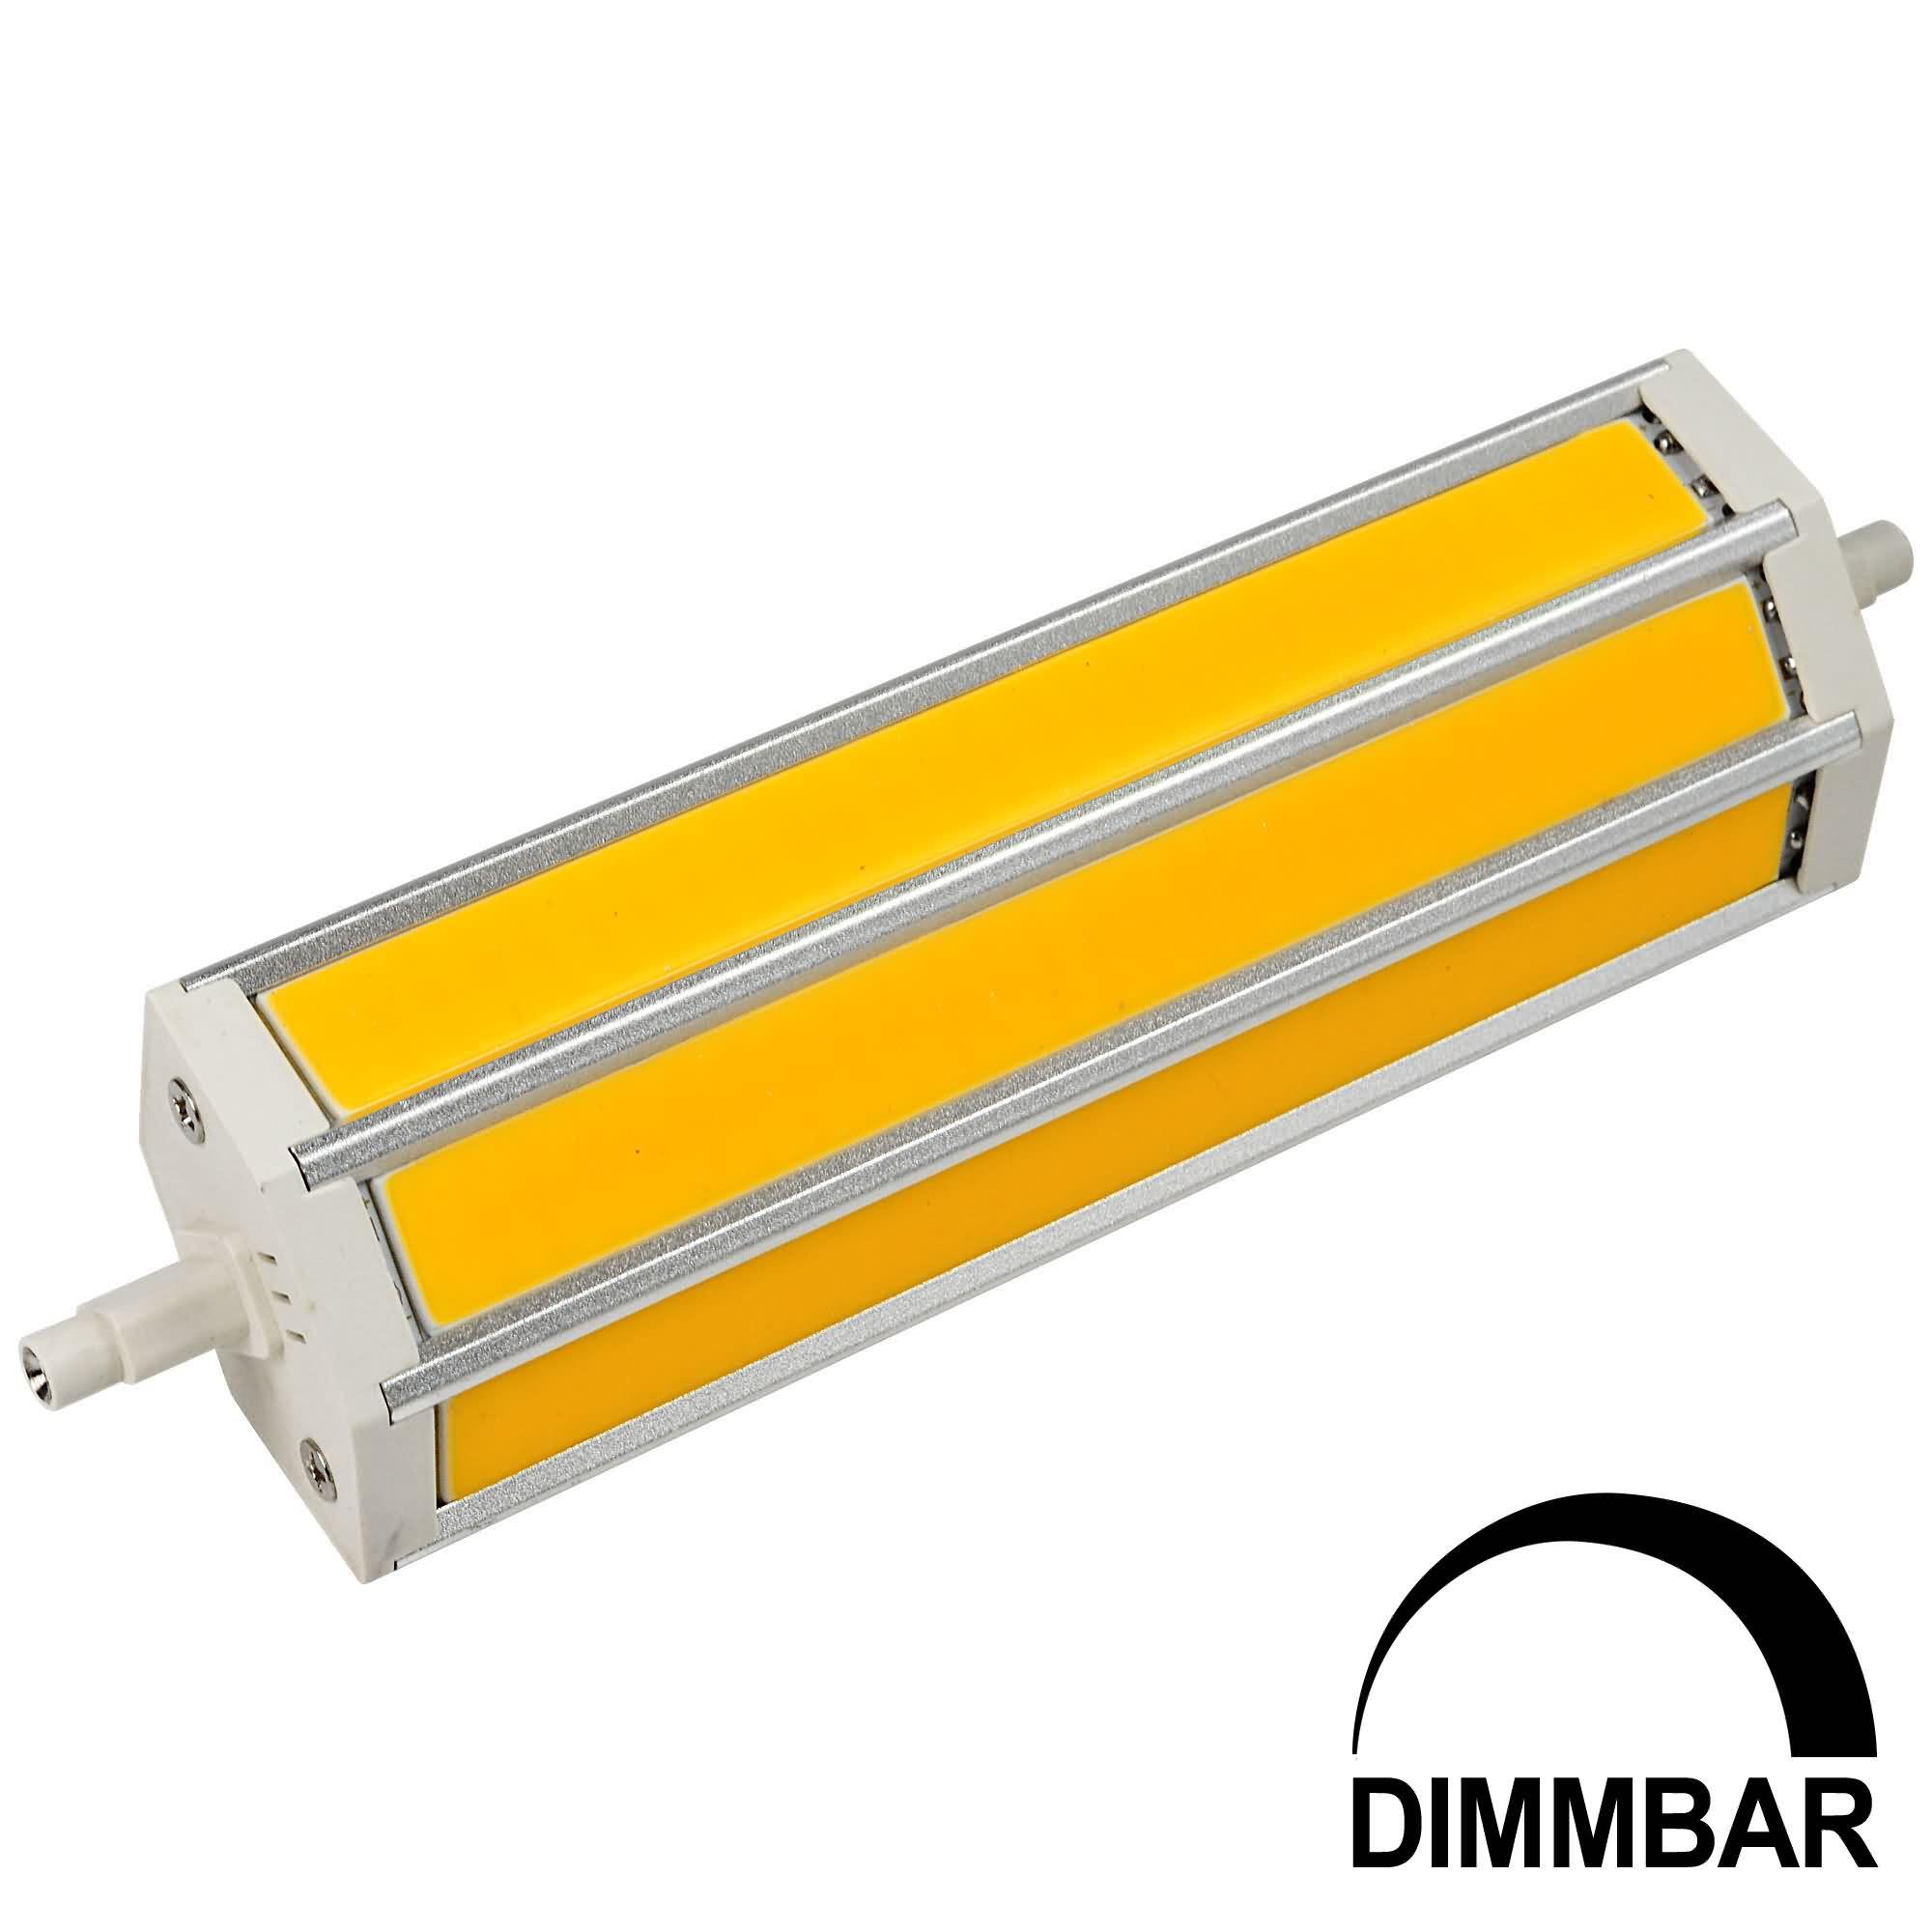 MENGS® R7S J189 15W LED Dimmable Flood Light 3 COB LED Lamp Bulb in Cool White Energy-saving Lamp